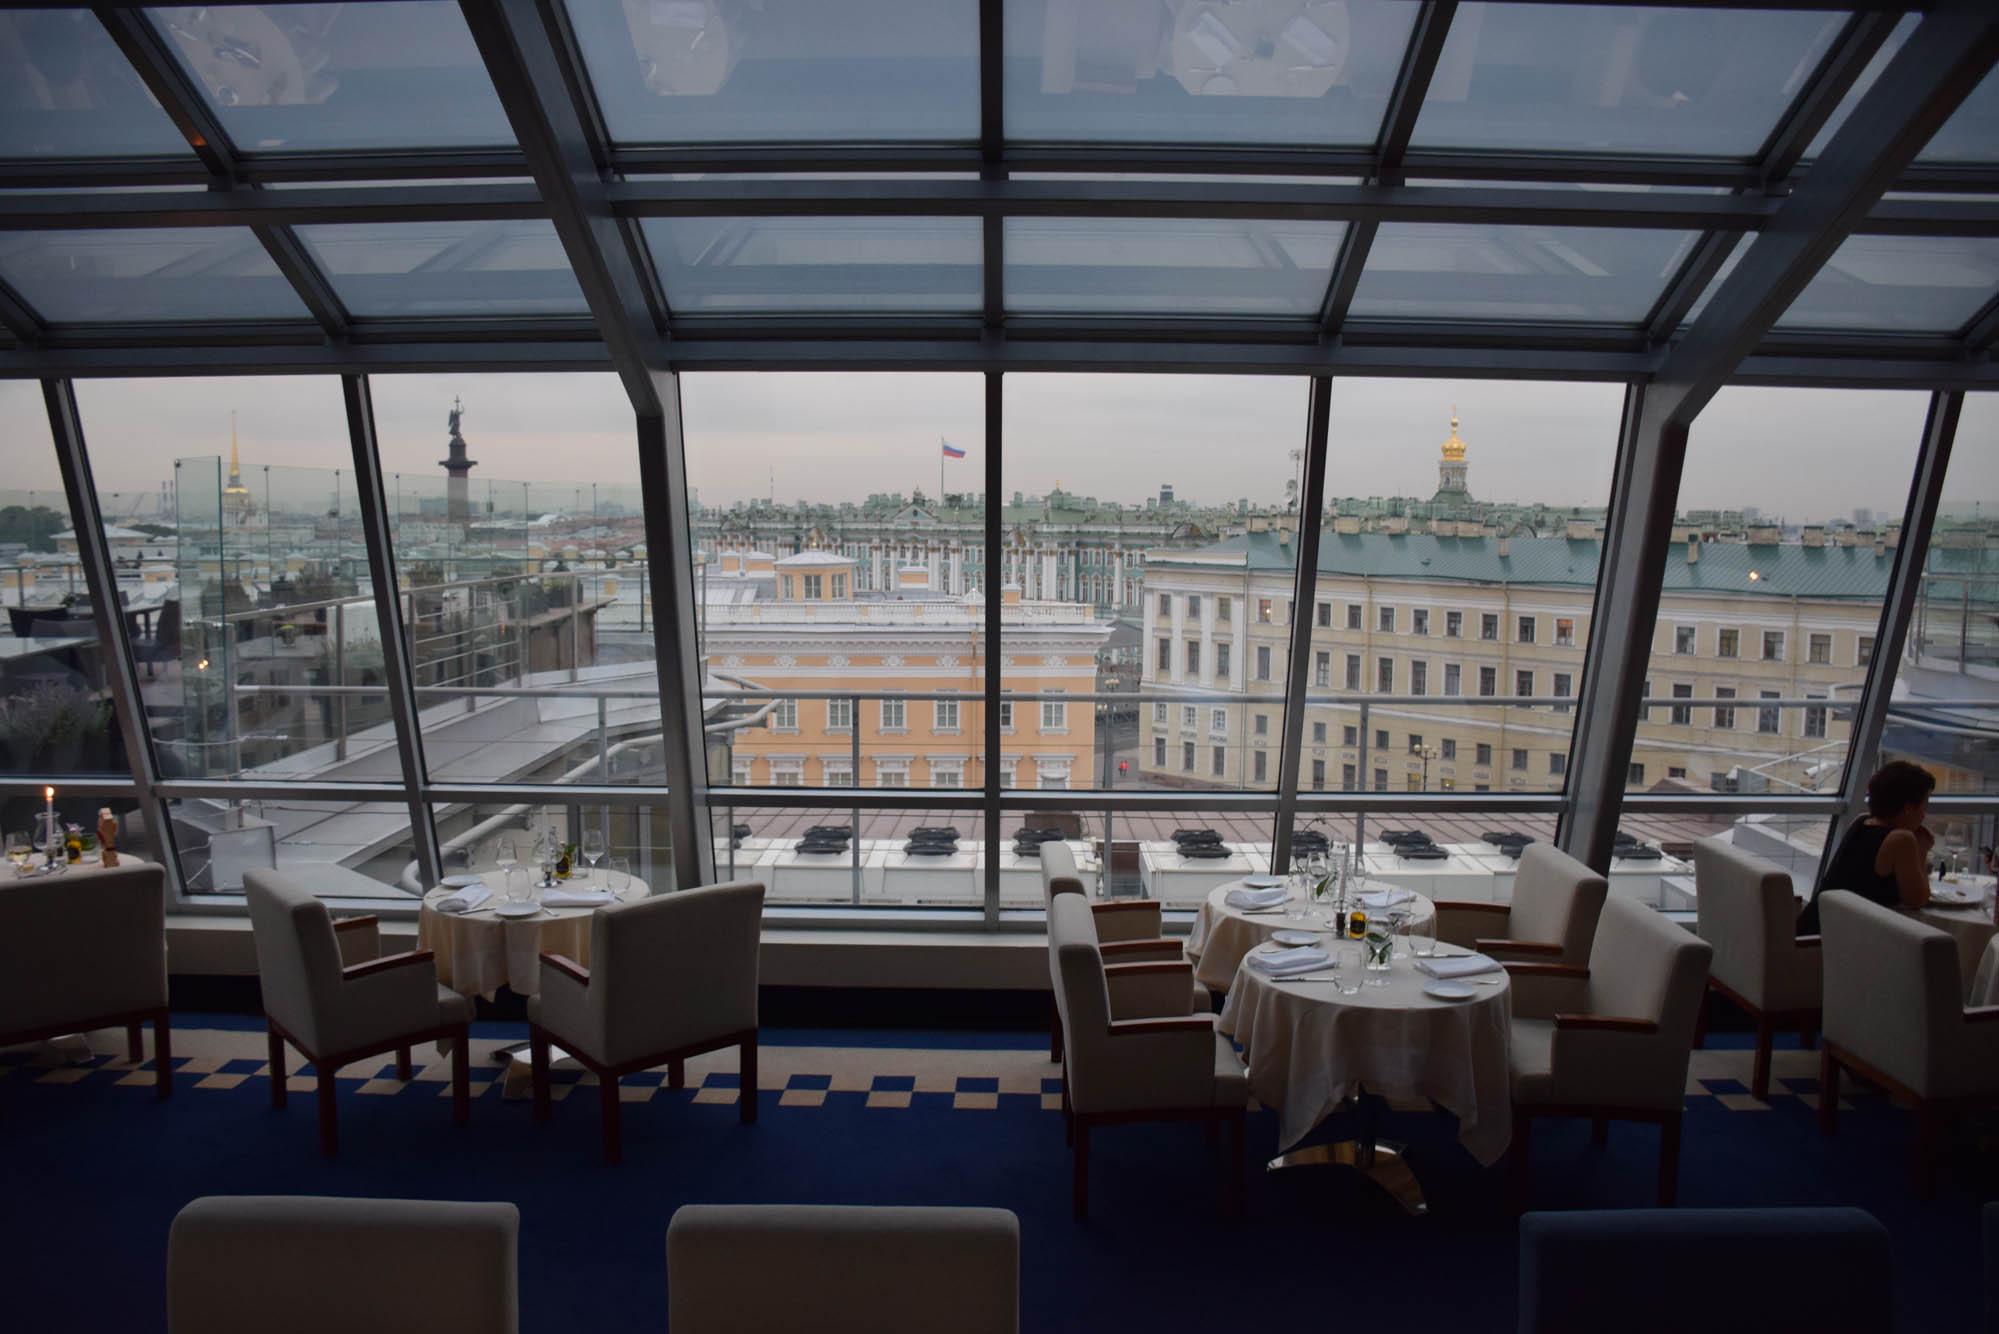 bellevue brasserie restaurant st petersburg kempinski moika 22 hotel russia 01